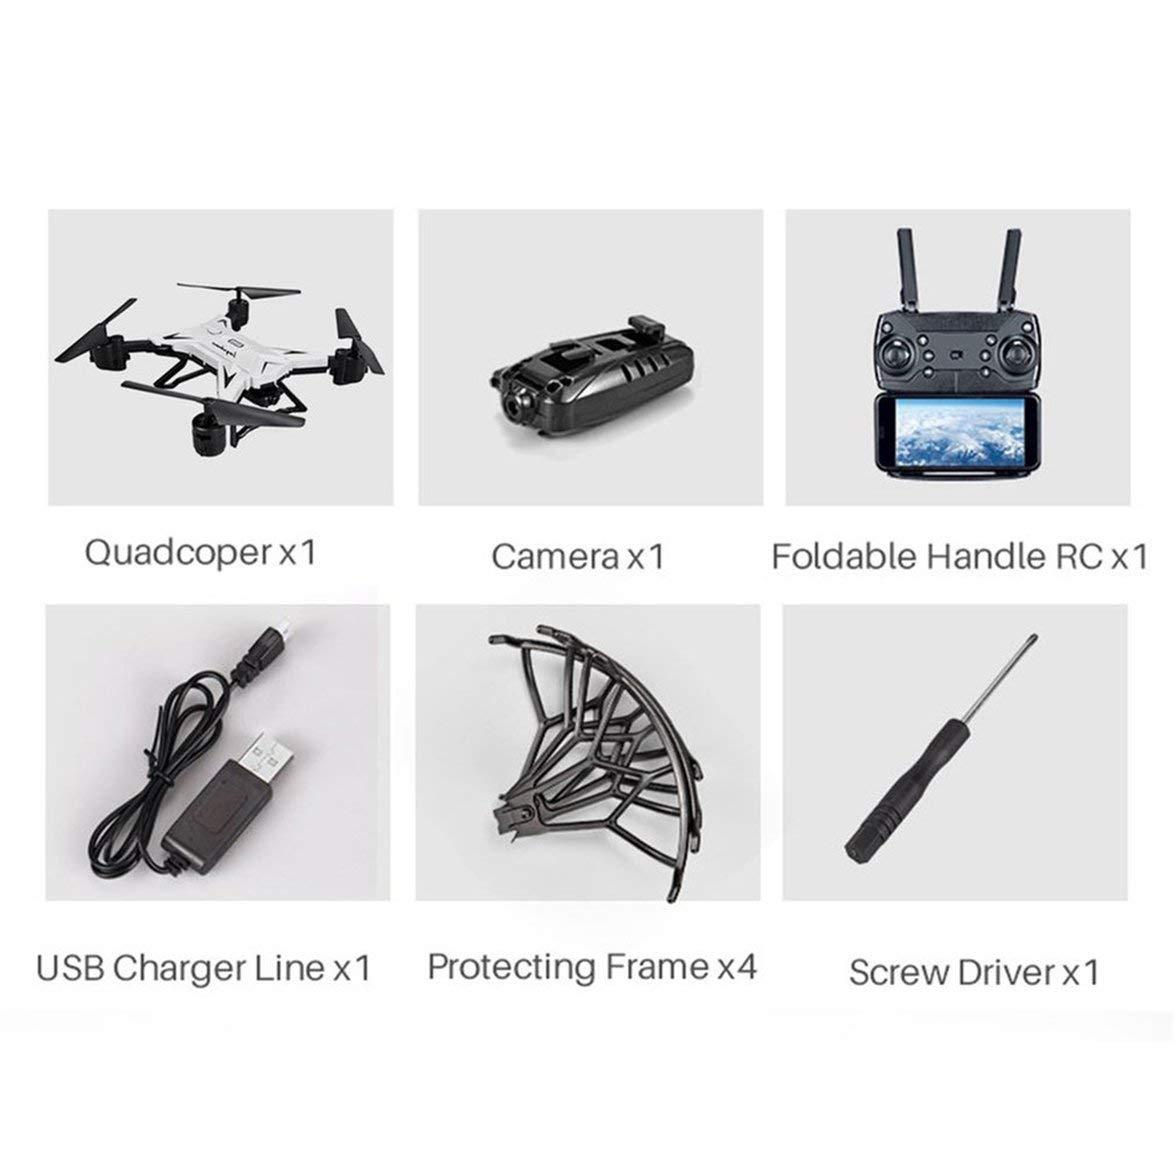 Drone Rc Camera Professional 30w Ky601s Kongqiabona Con rCxBQdoeW